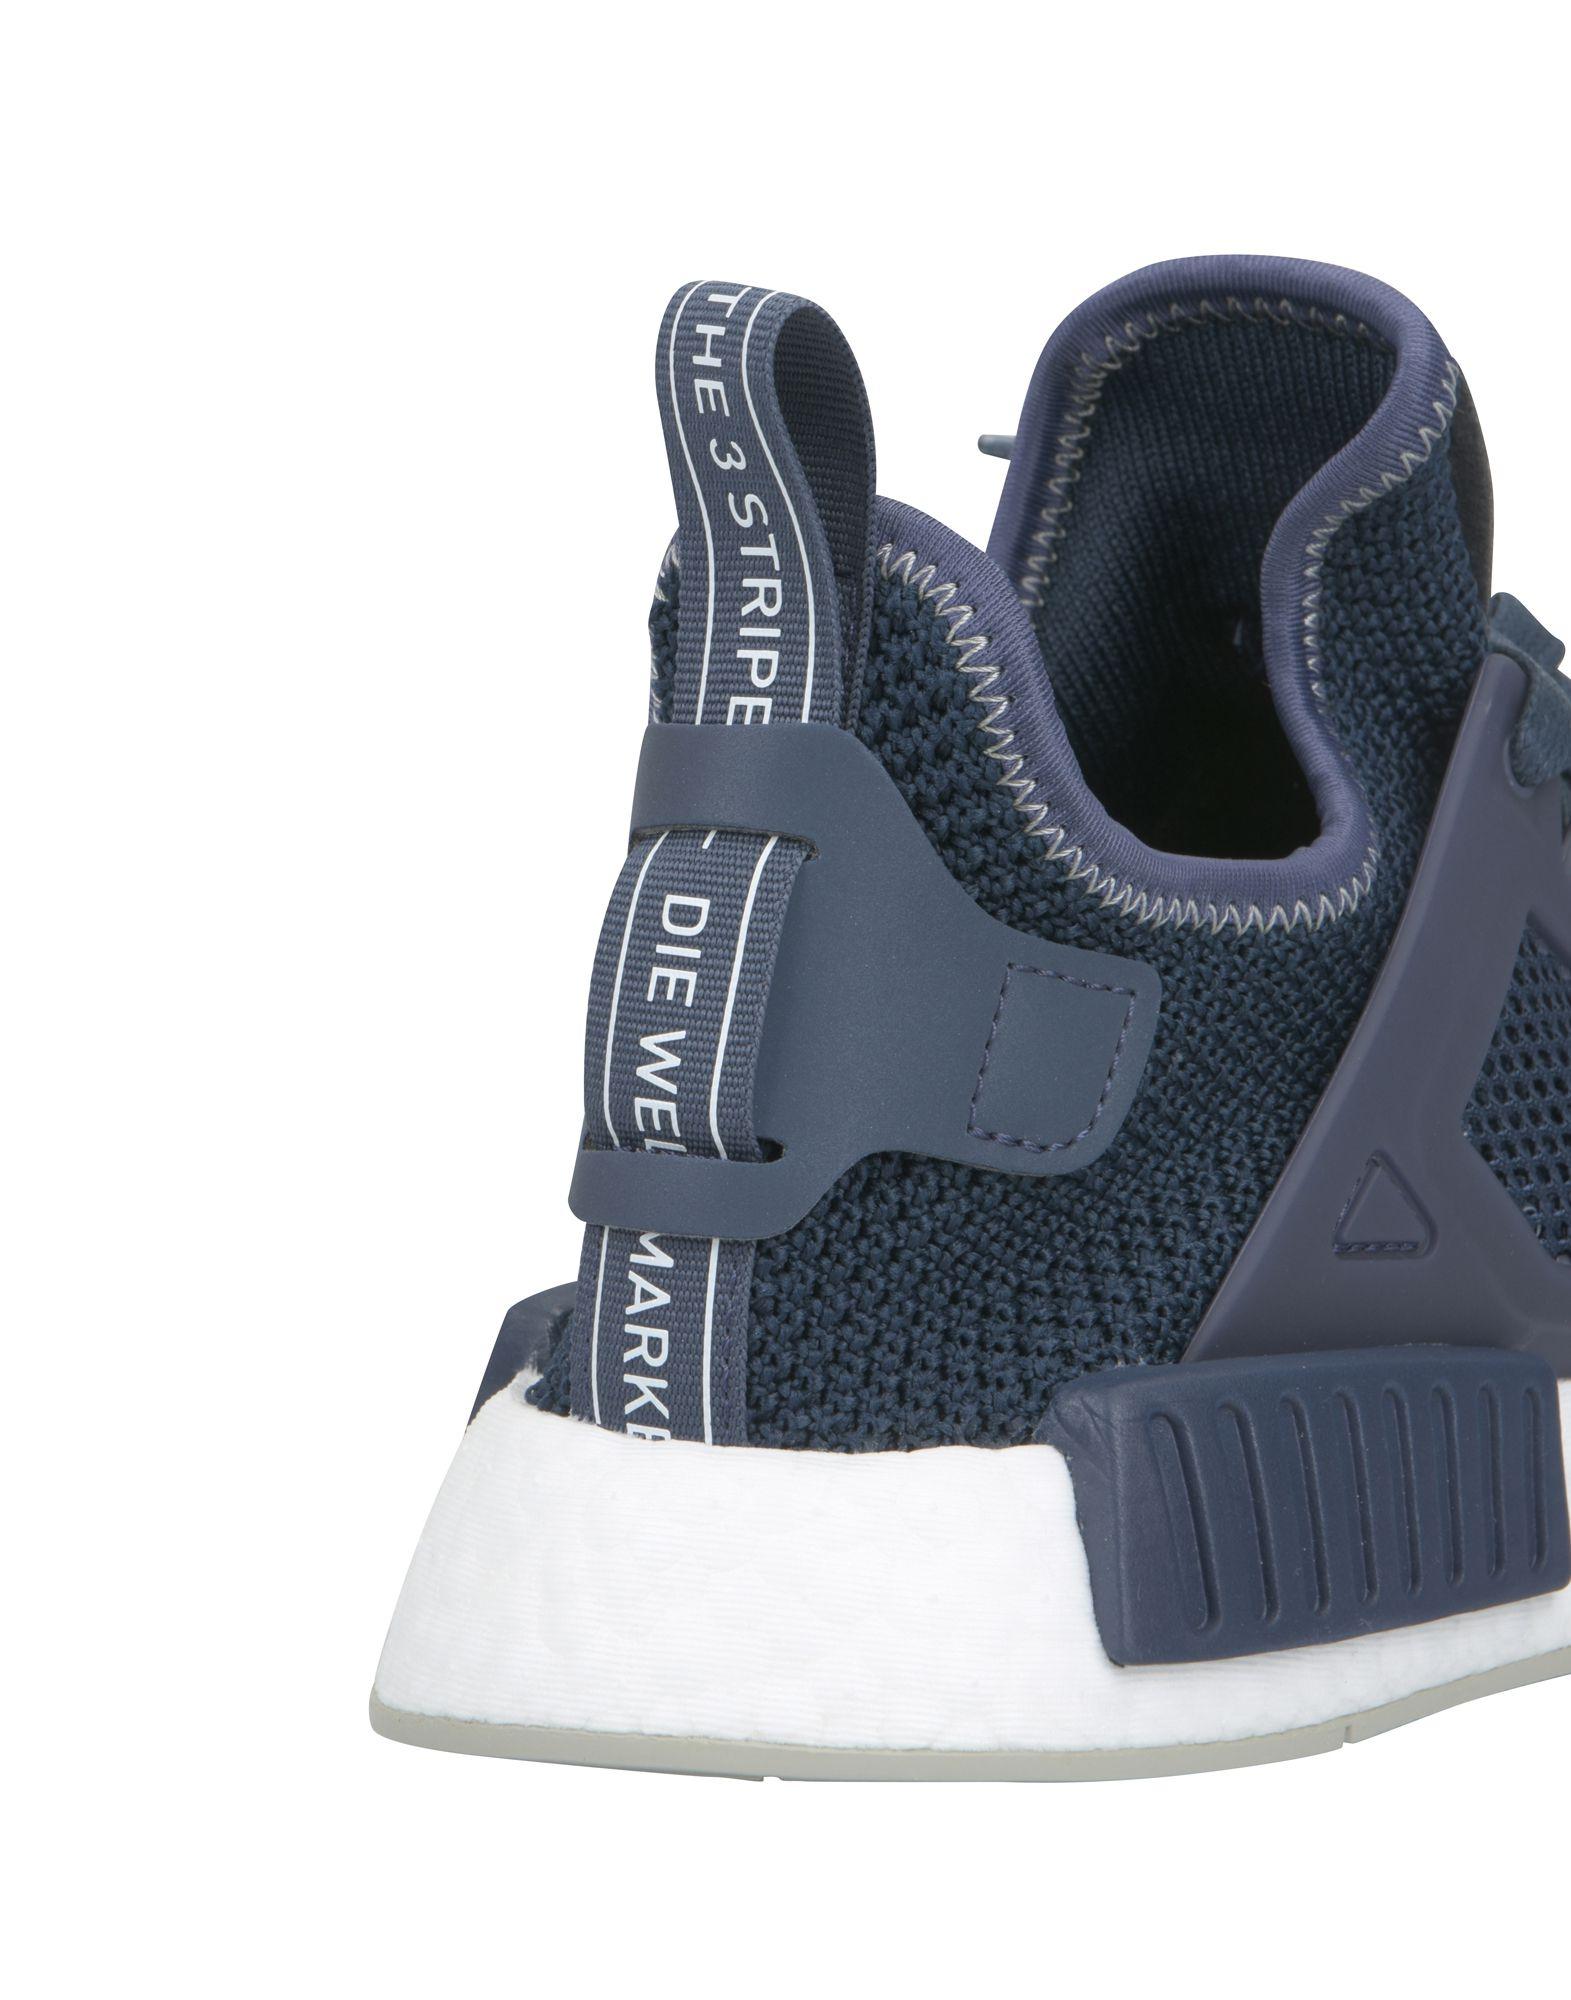 Stilvolle billige Schuhe Adidas Originals Nmd_Xr1 W  11403088FN 11403088FN 11403088FN aec646